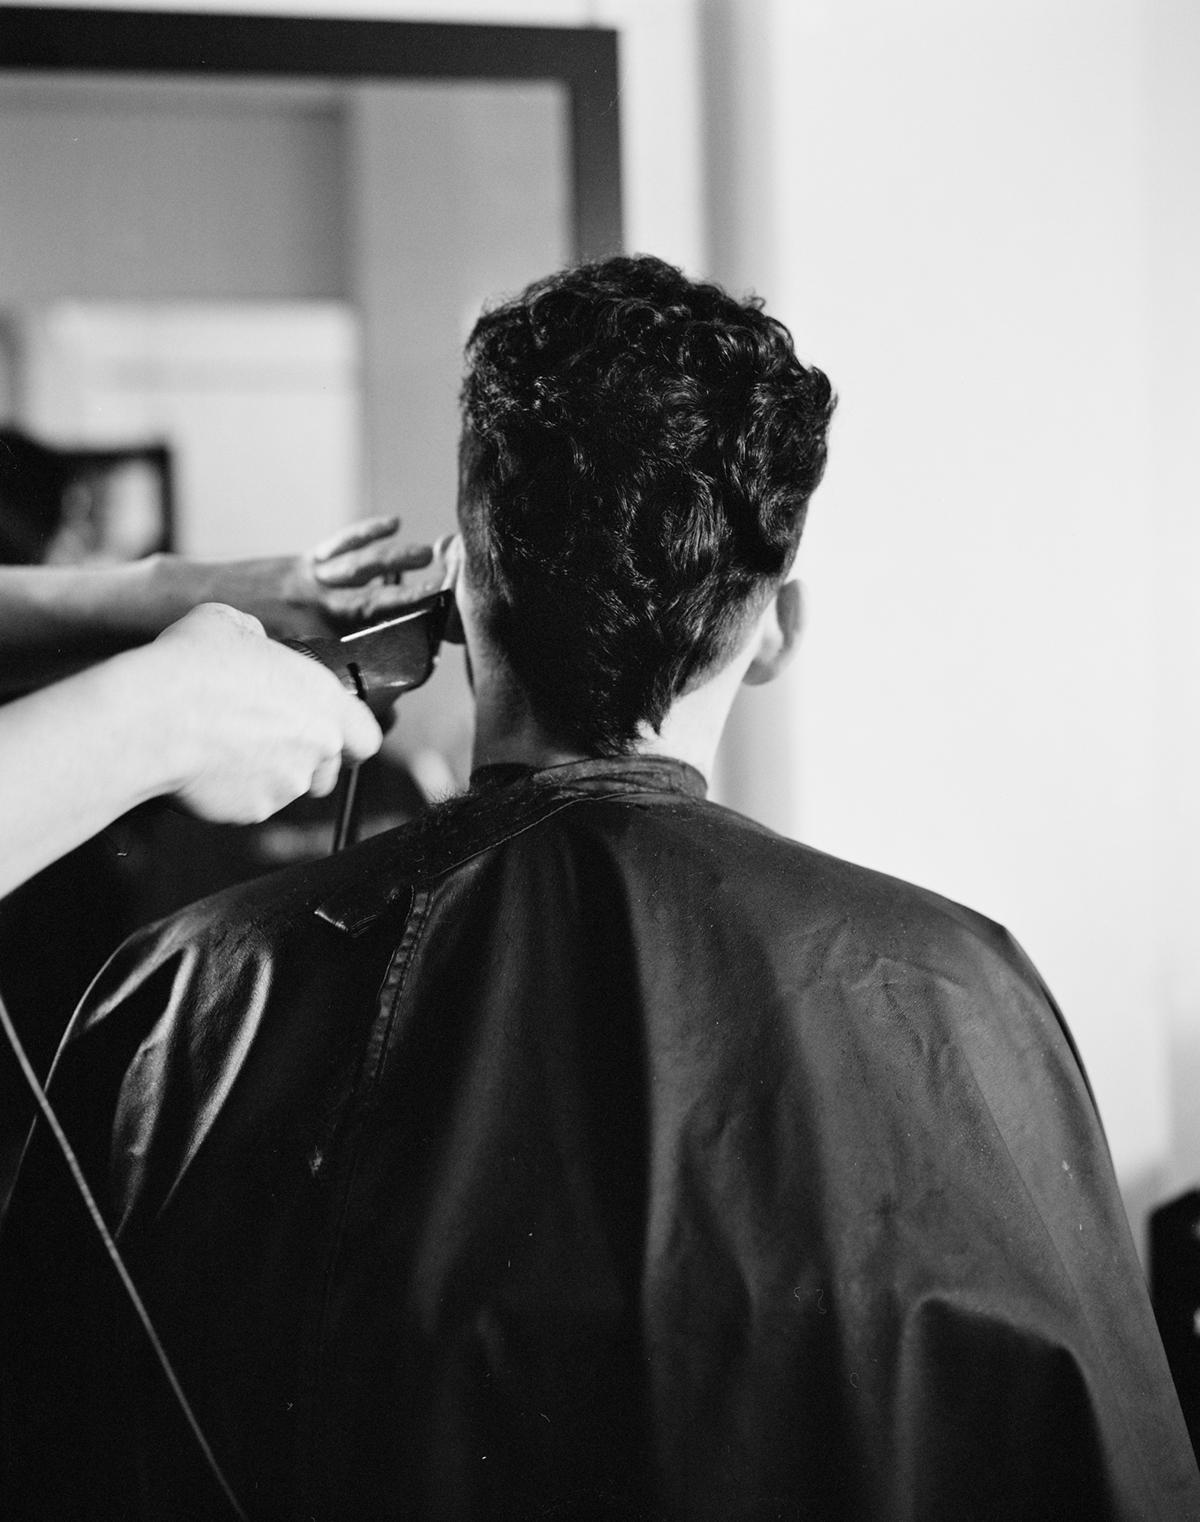 hair shave small.jpg